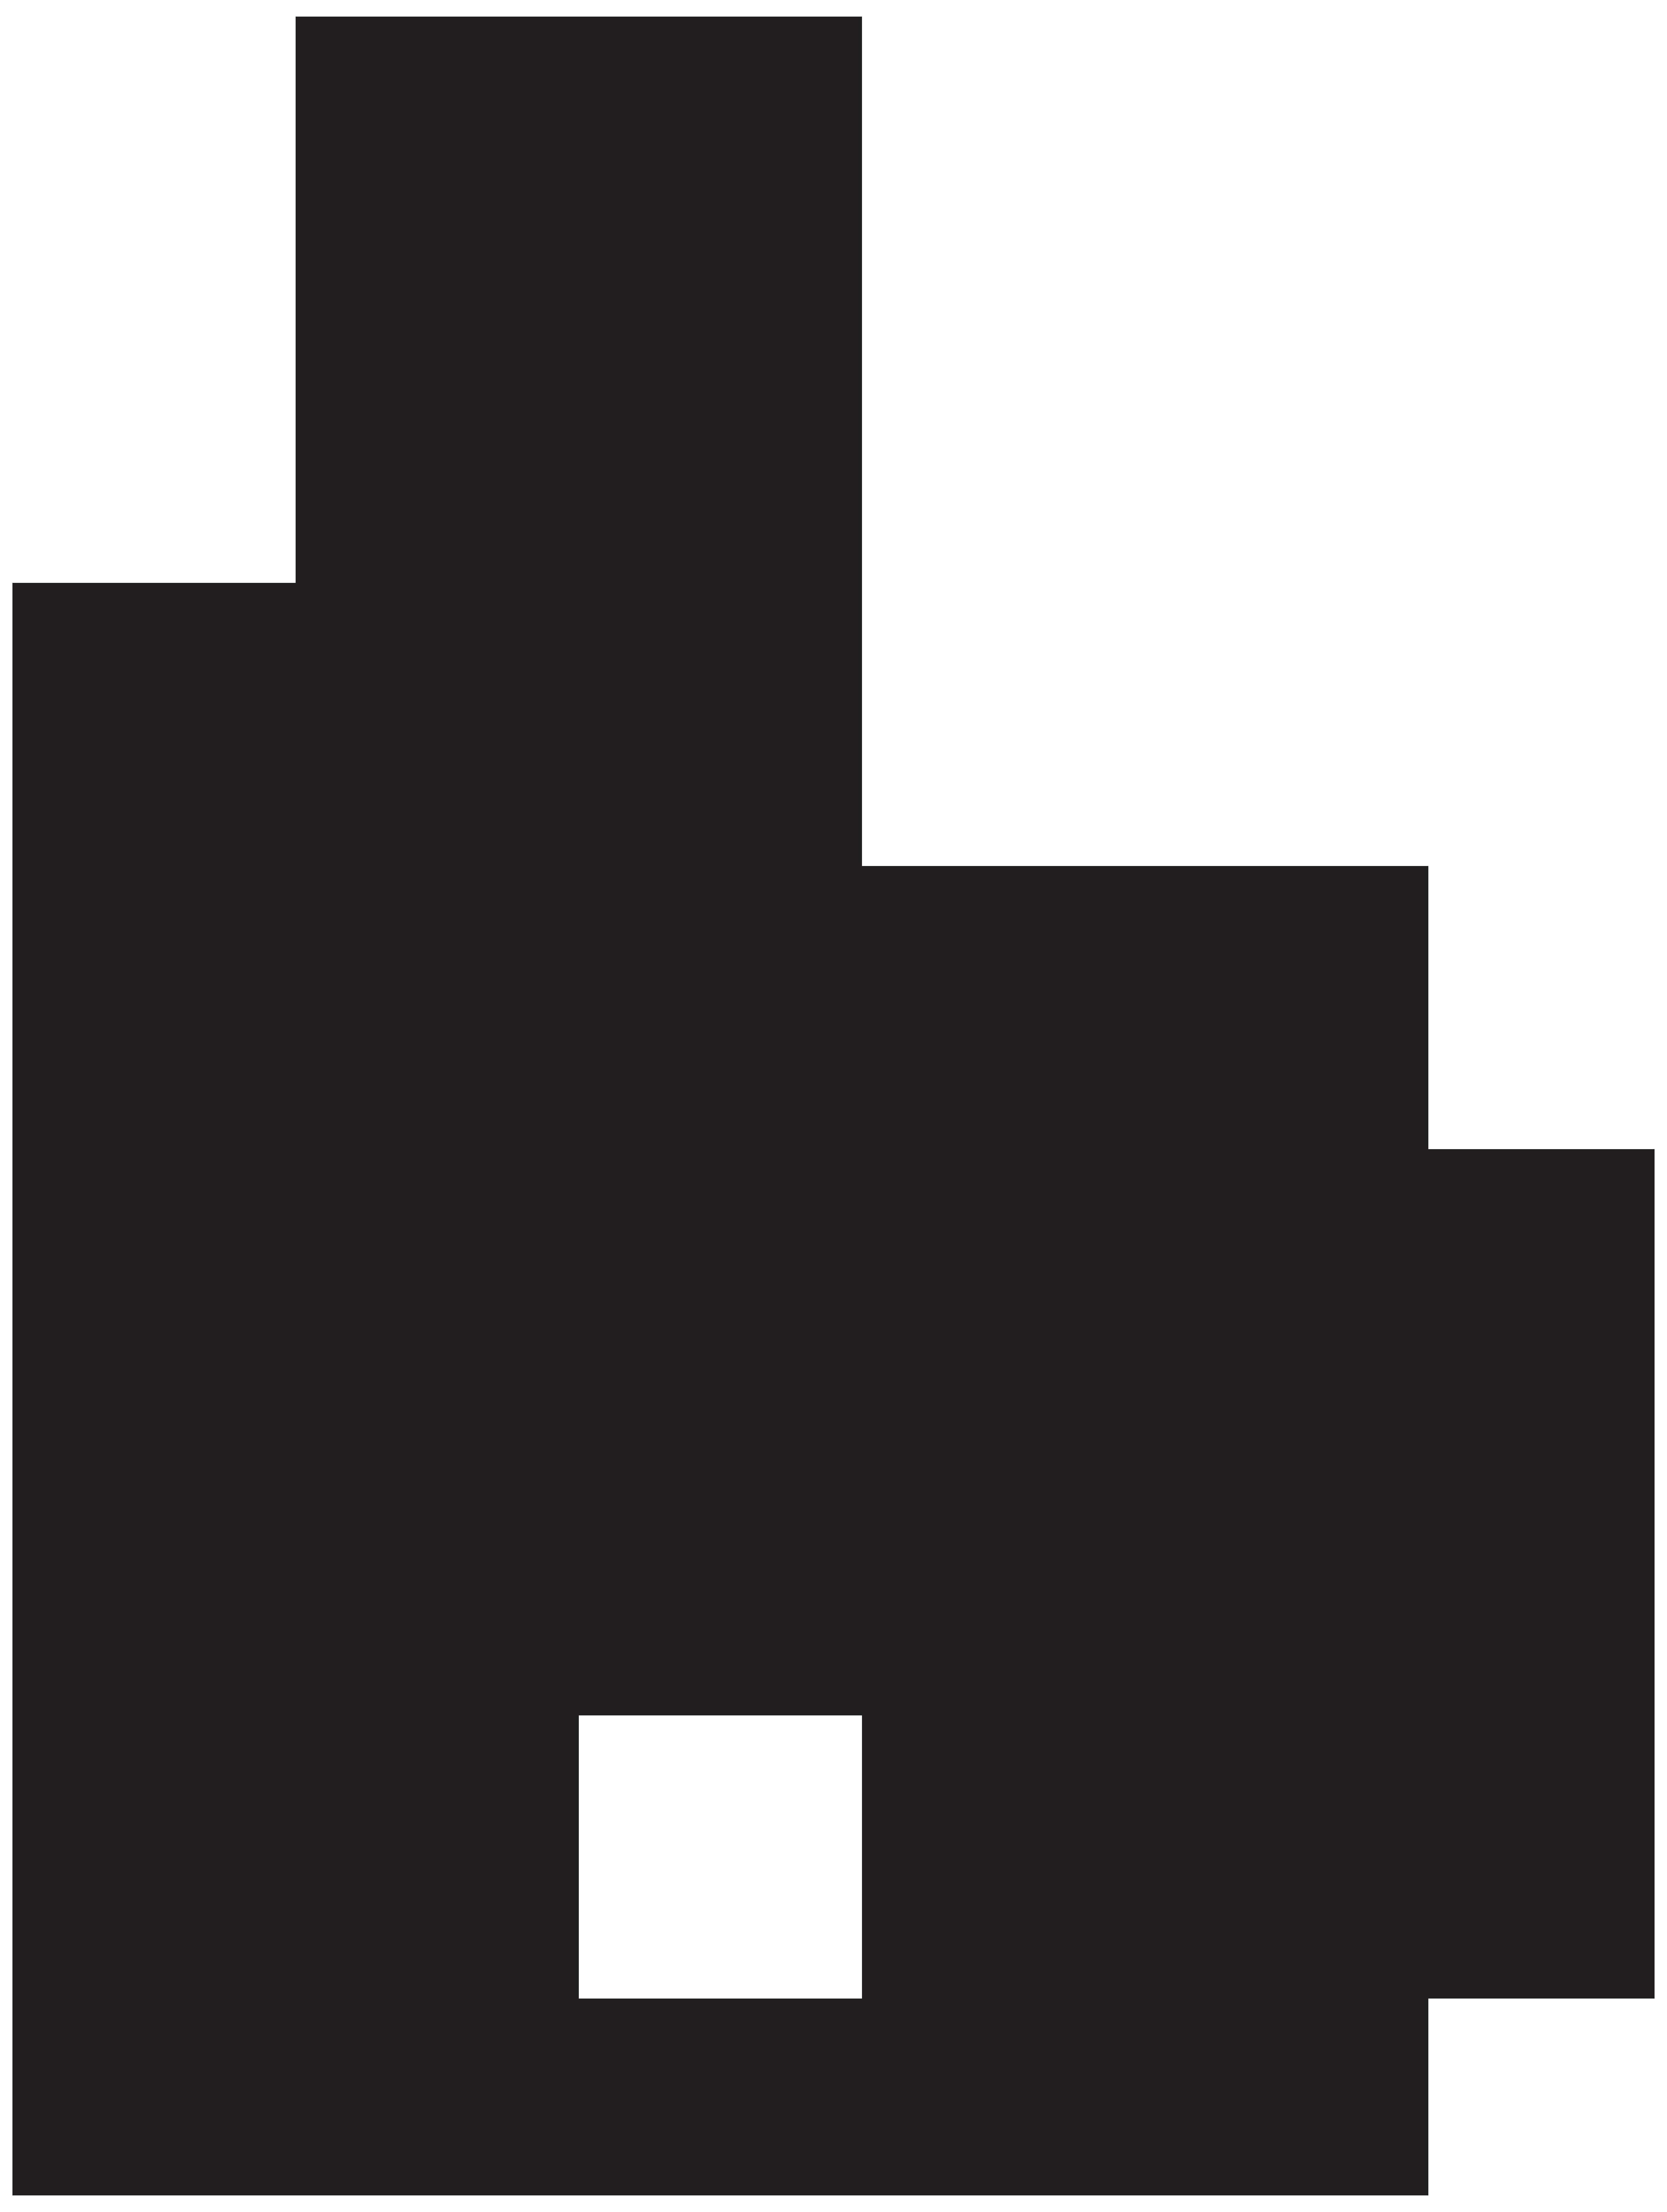 6028x8000 Mermaid Silhouette Png Clip Artu200b Gallery Yopriceville